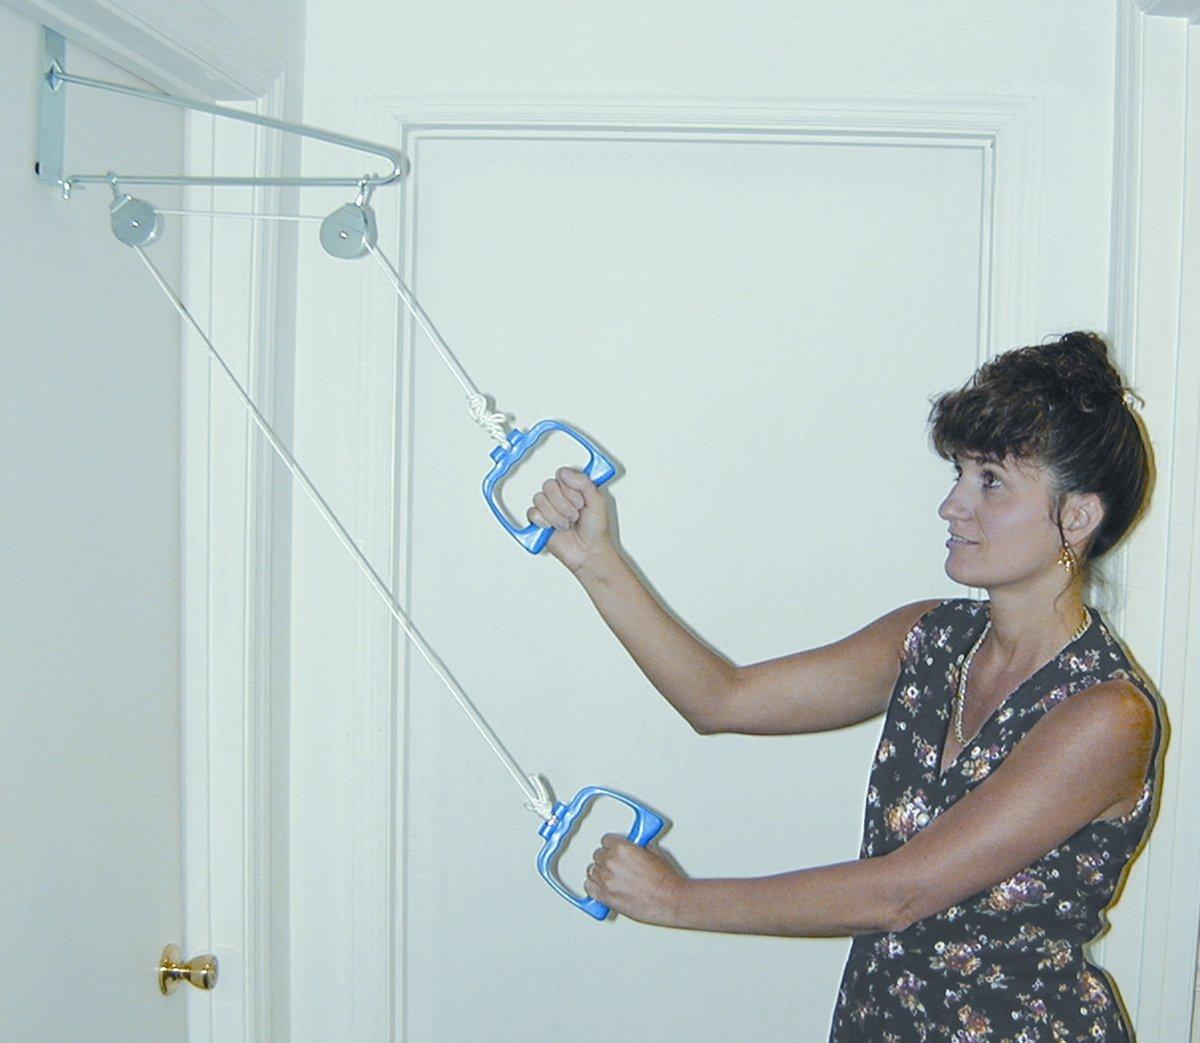 Dmi Shoulder Arm Exercise Pulley Set Over The Door Ebay